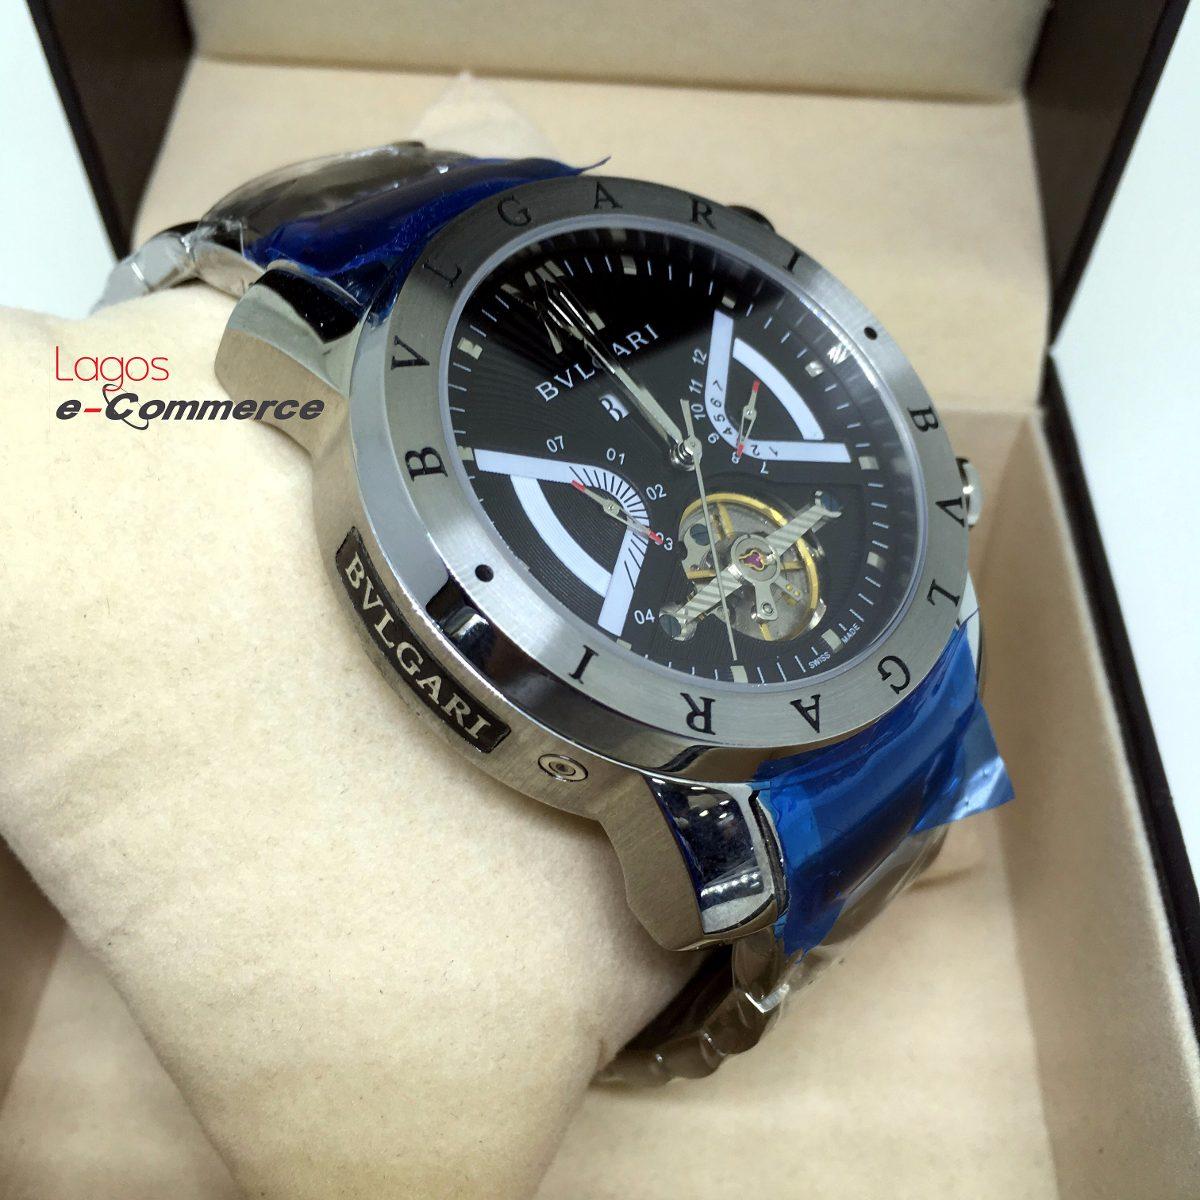 ad5b252515c relógio bulgari iron man aço automático produto original r. Carregando zoom.